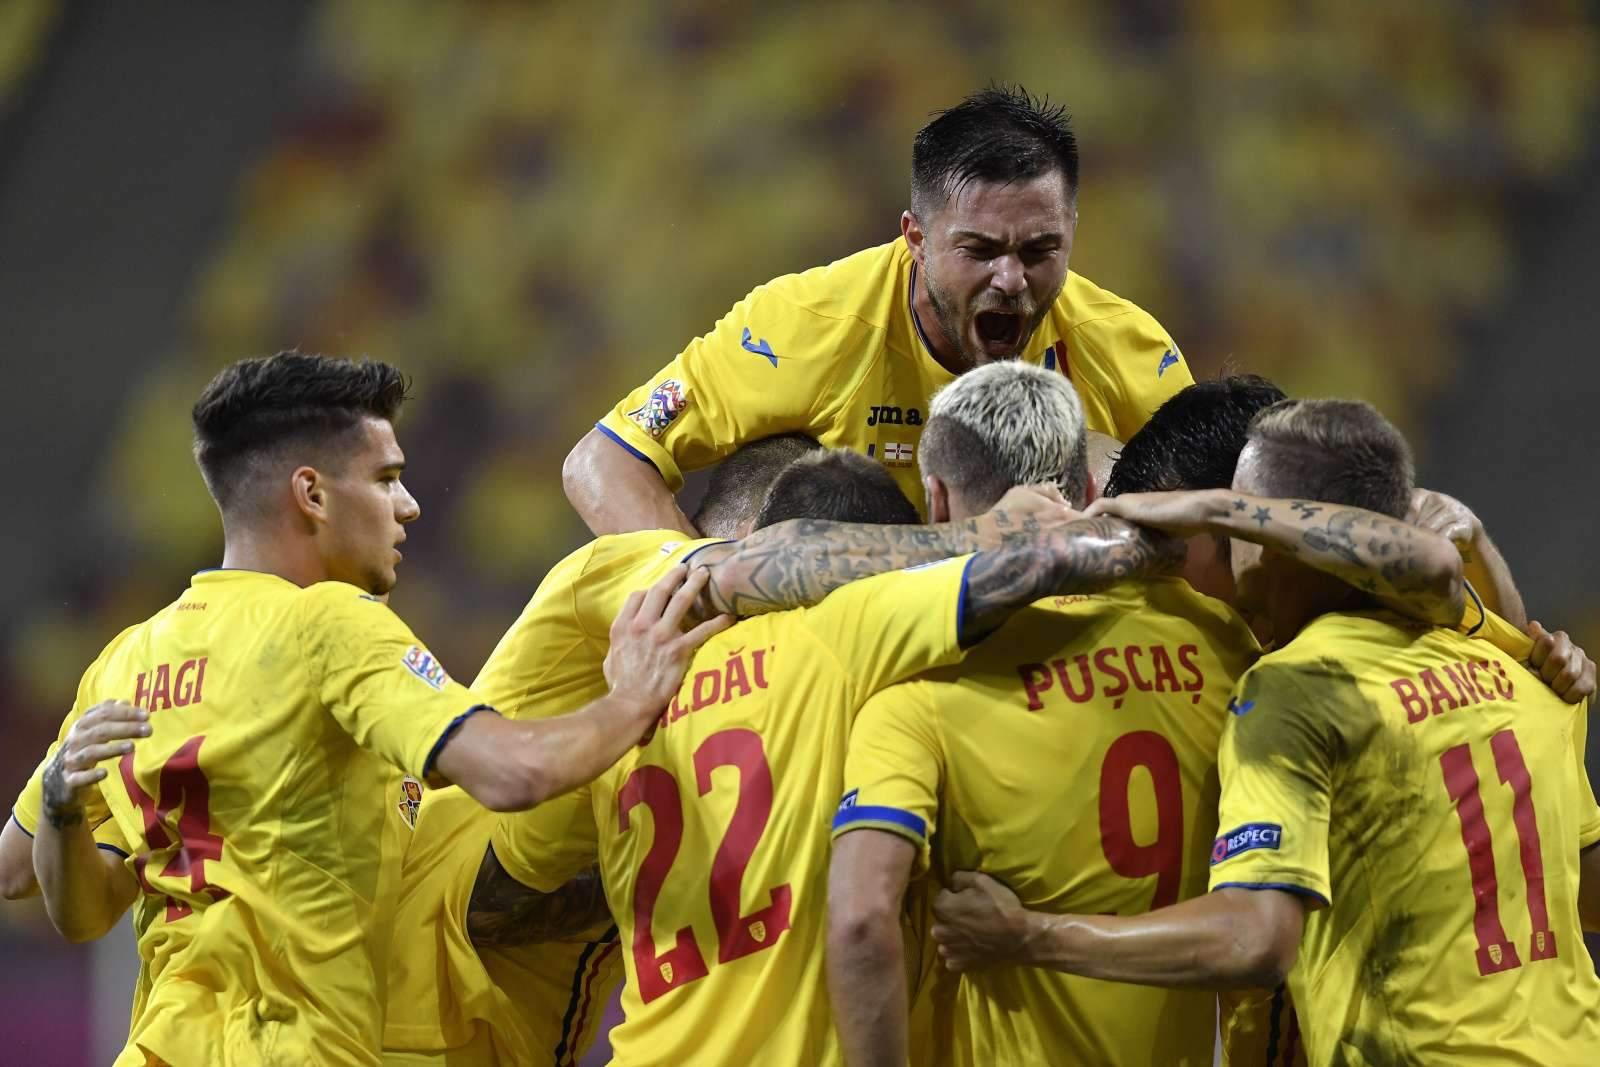 Румыния – Лихтенштейн: прогноз на матч отборочного цикла чемпионата мира-2022 - 5 сентября 2021